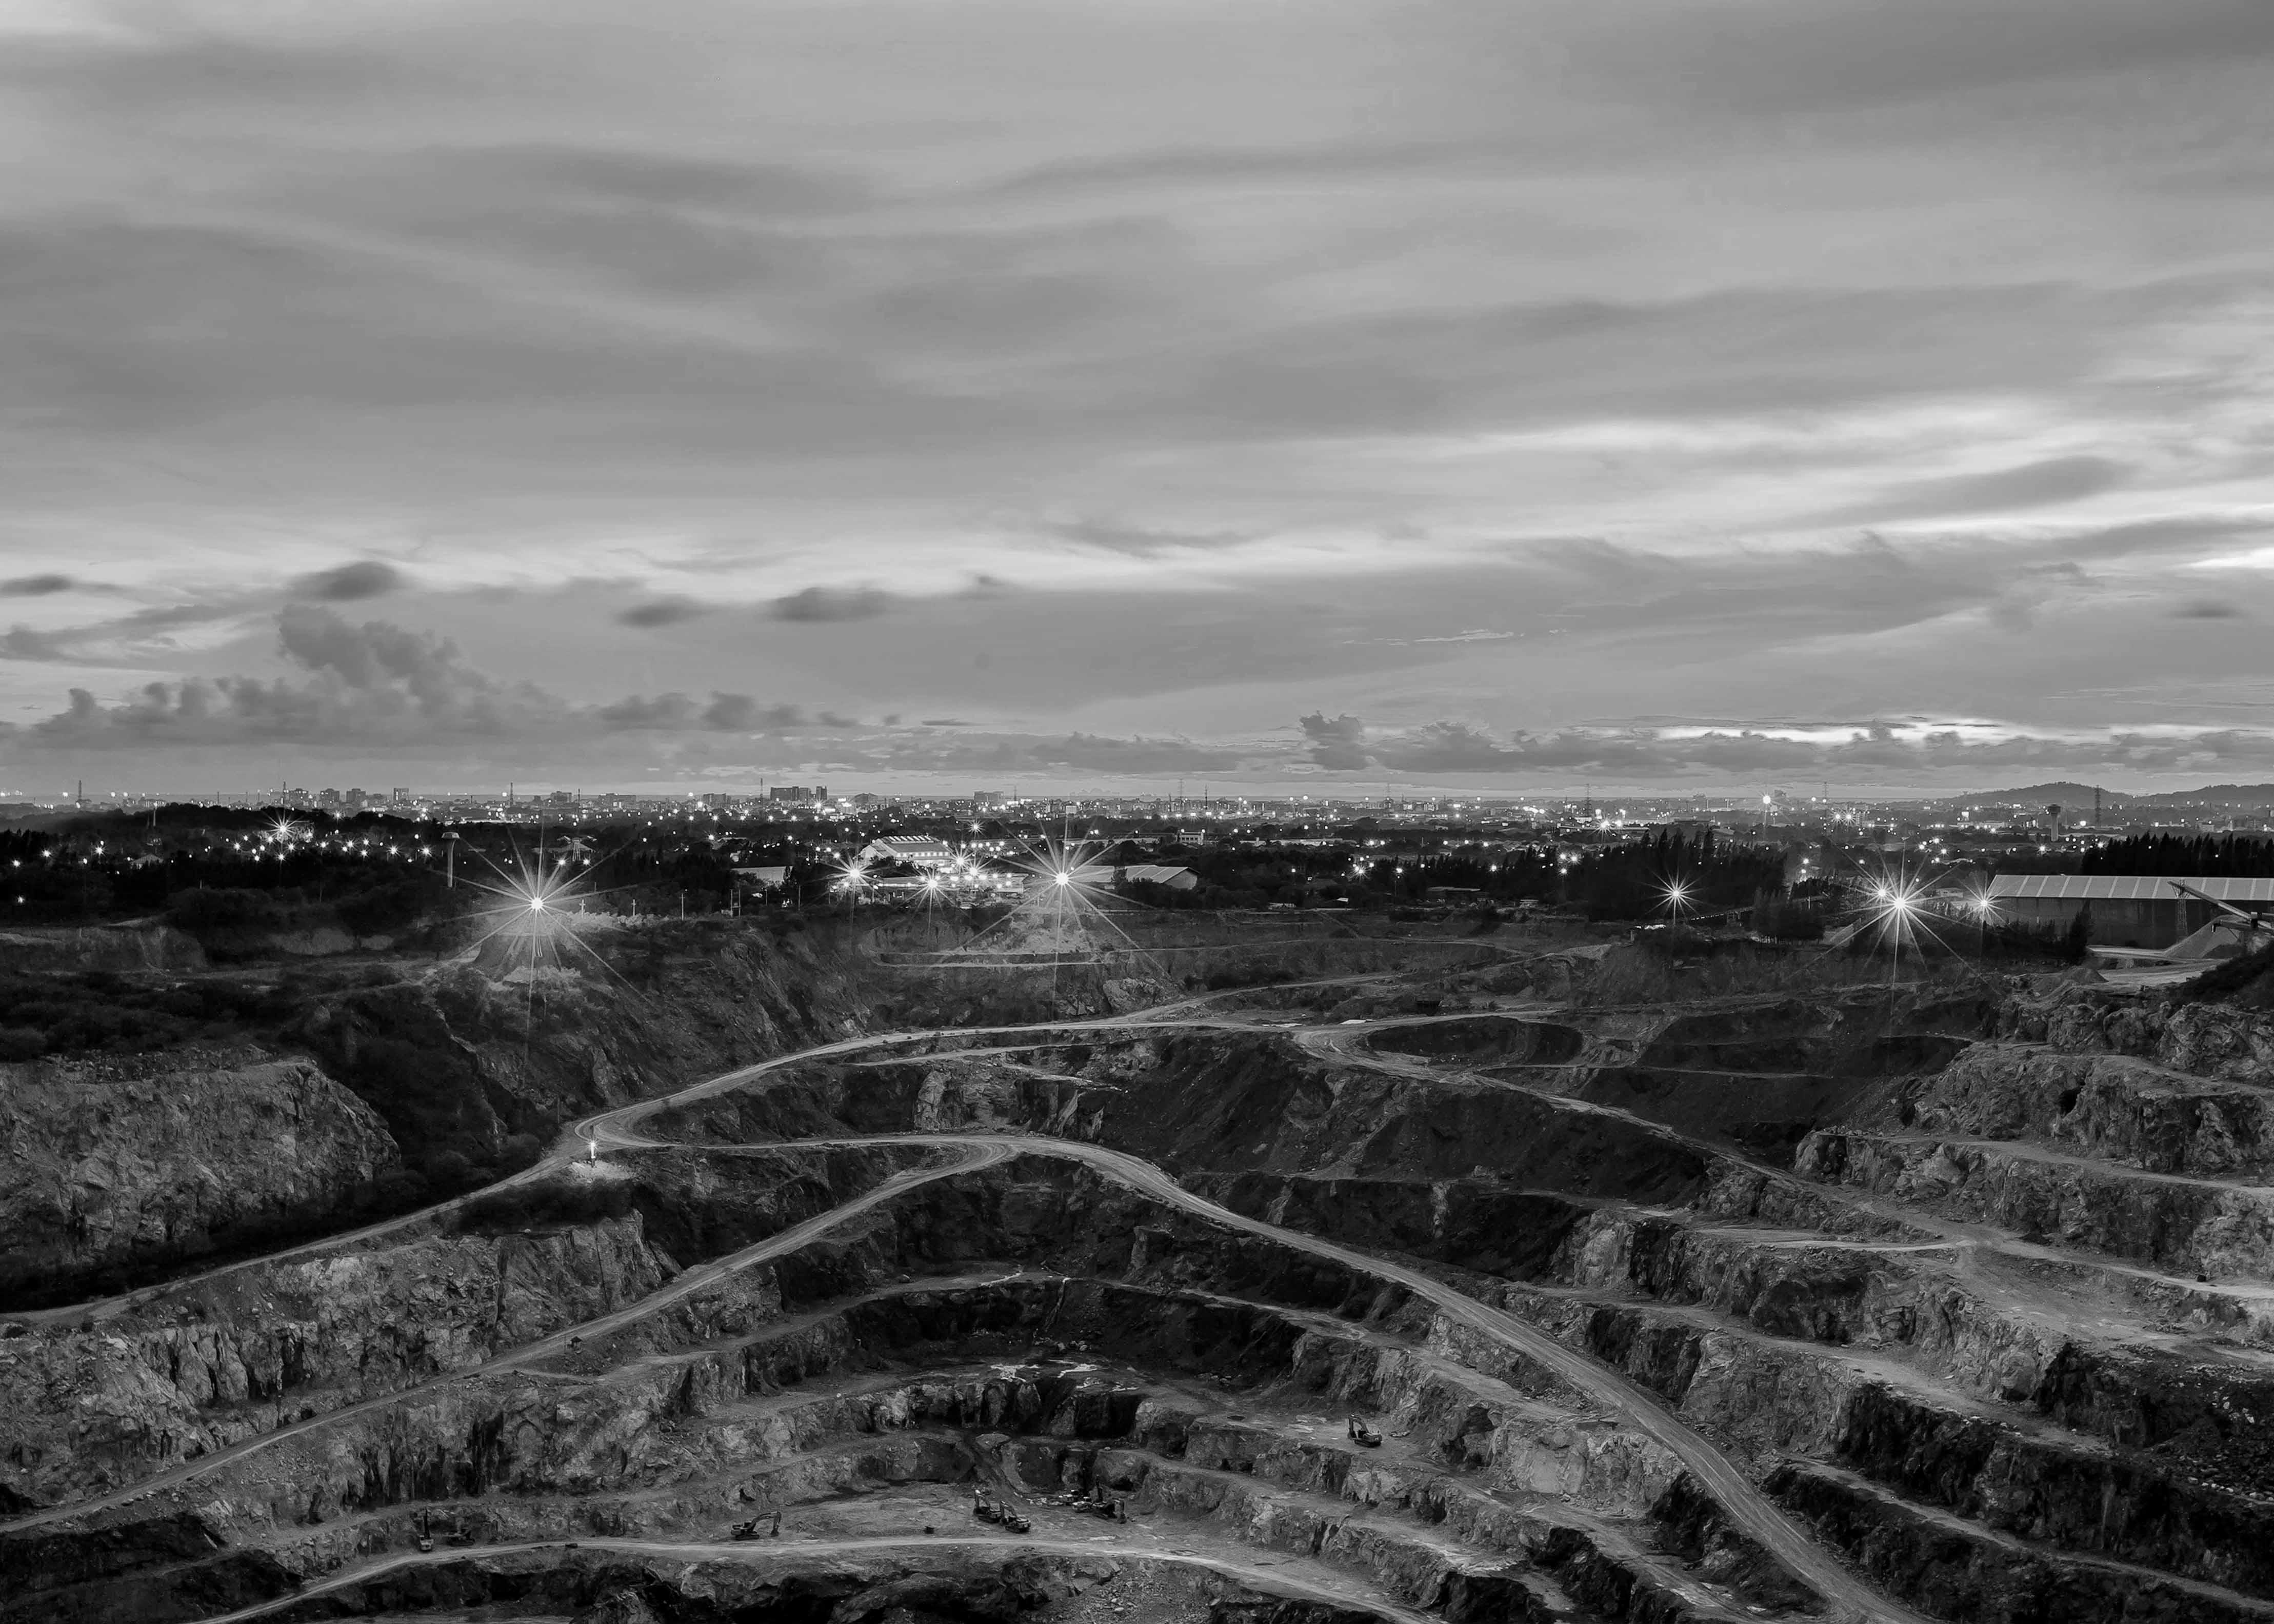 DataCloud Coal Seem detection void detection mineportal digital twin